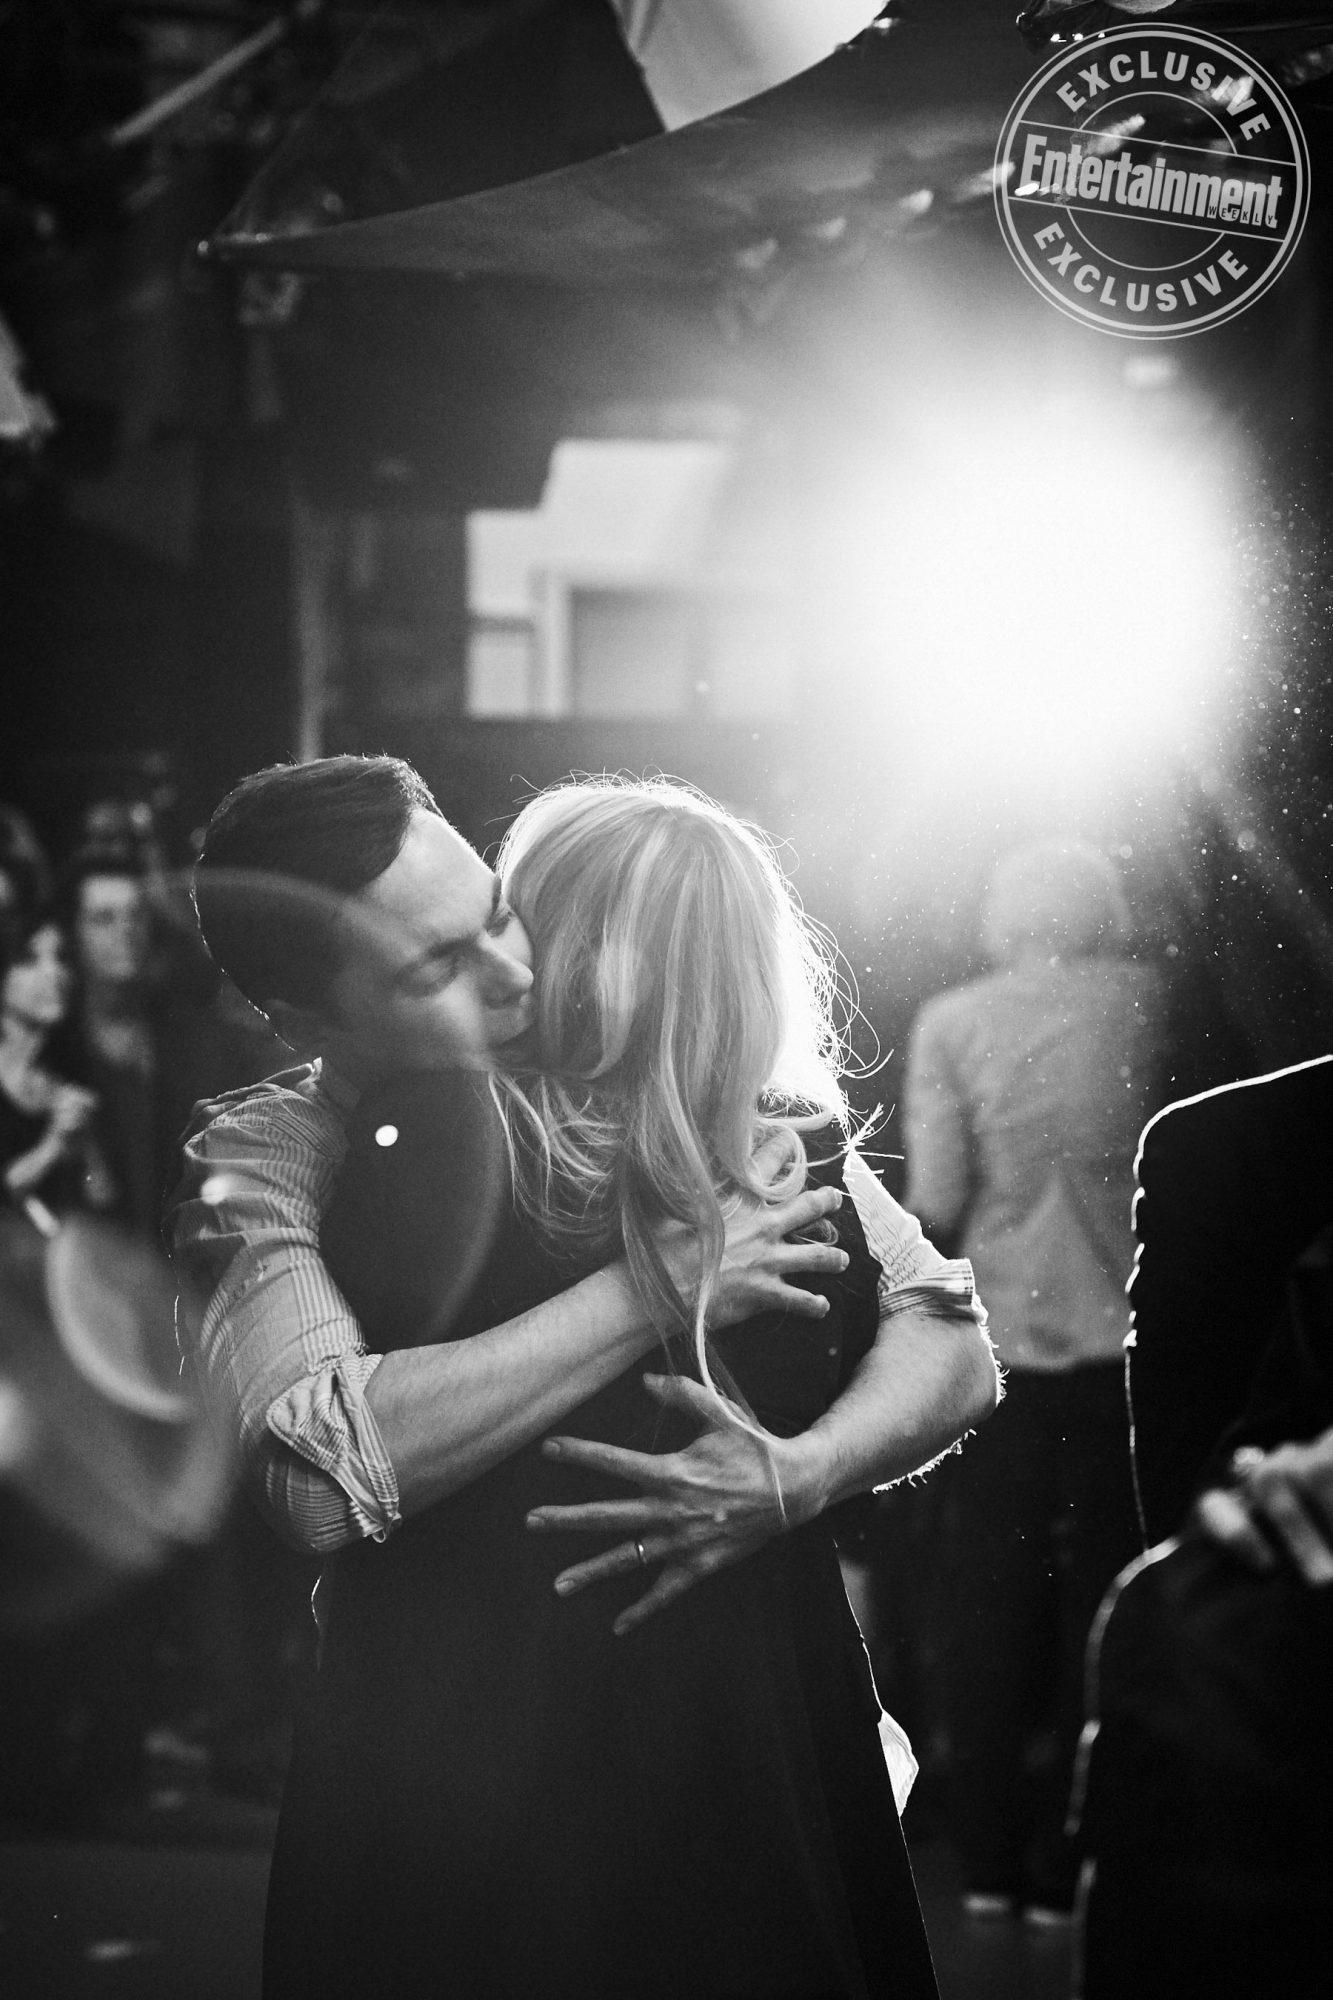 The Big Bang Theory BTSCR: Joe Pugliese/CBS